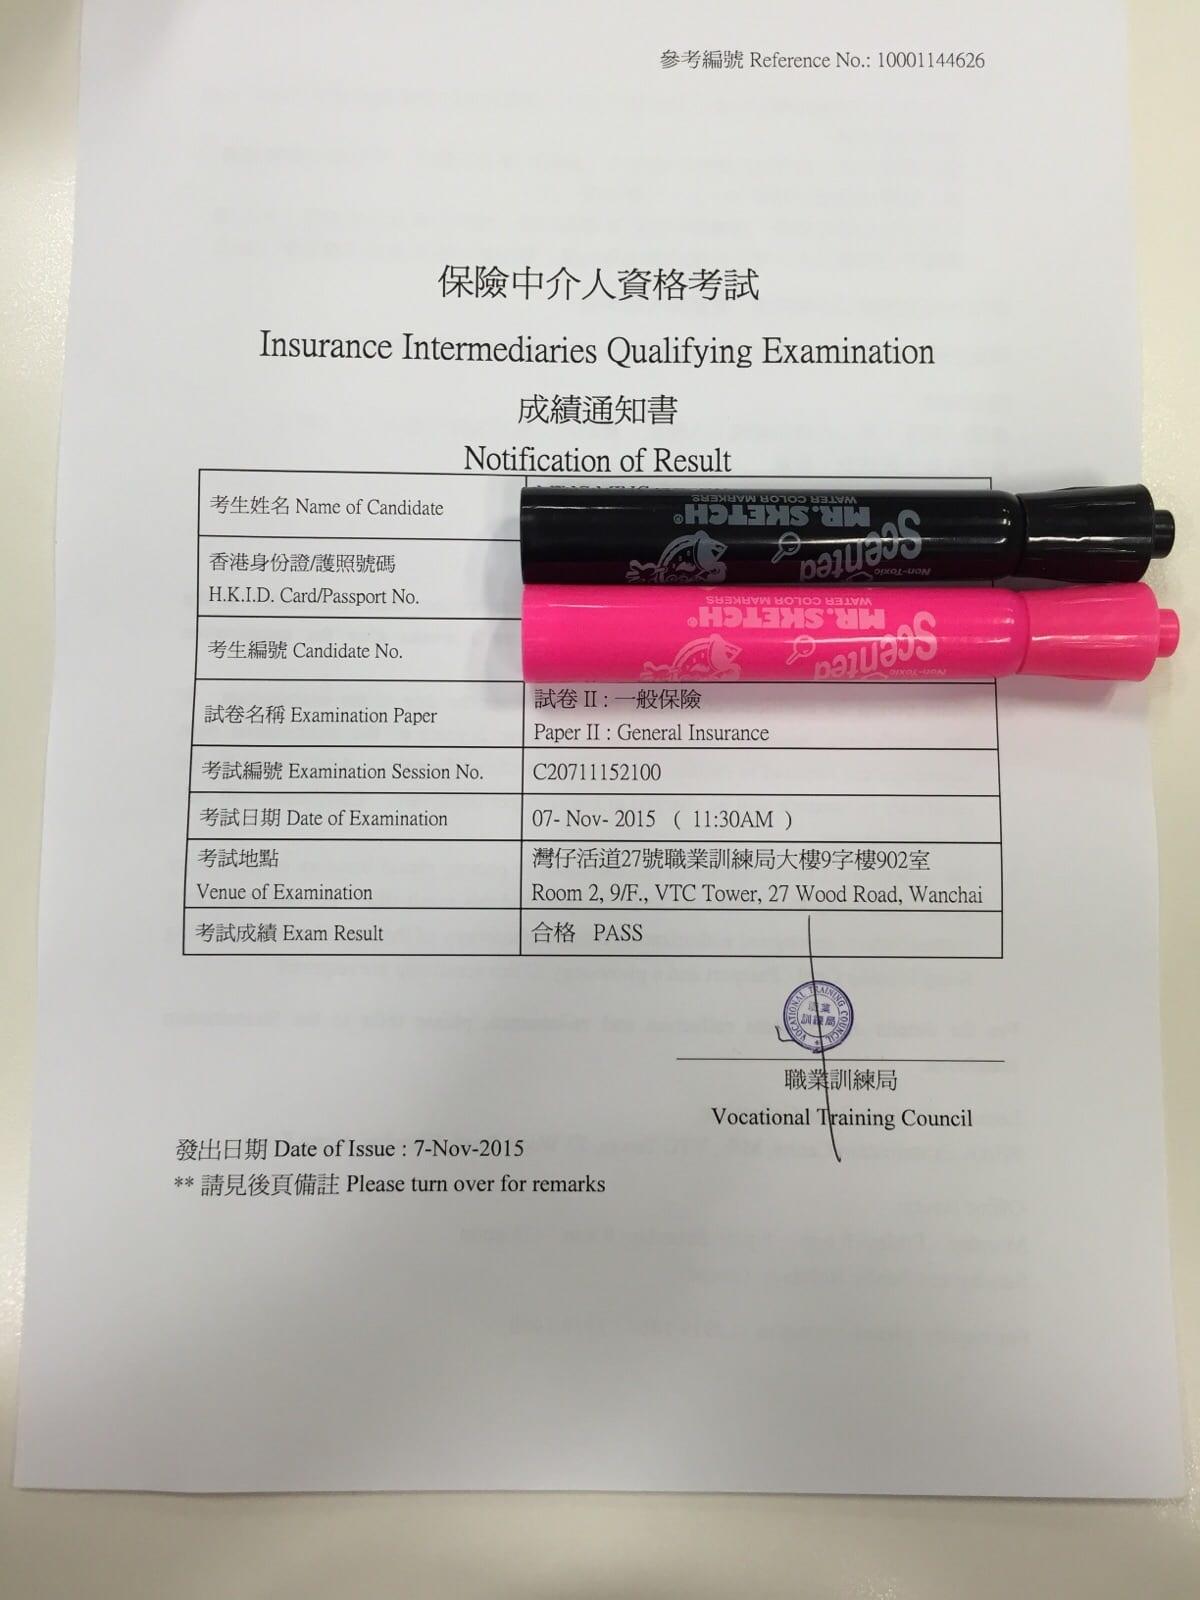 Mingming 7/11/2015 IIQE Paper 2 保險中介人資格考試卷二 Pass